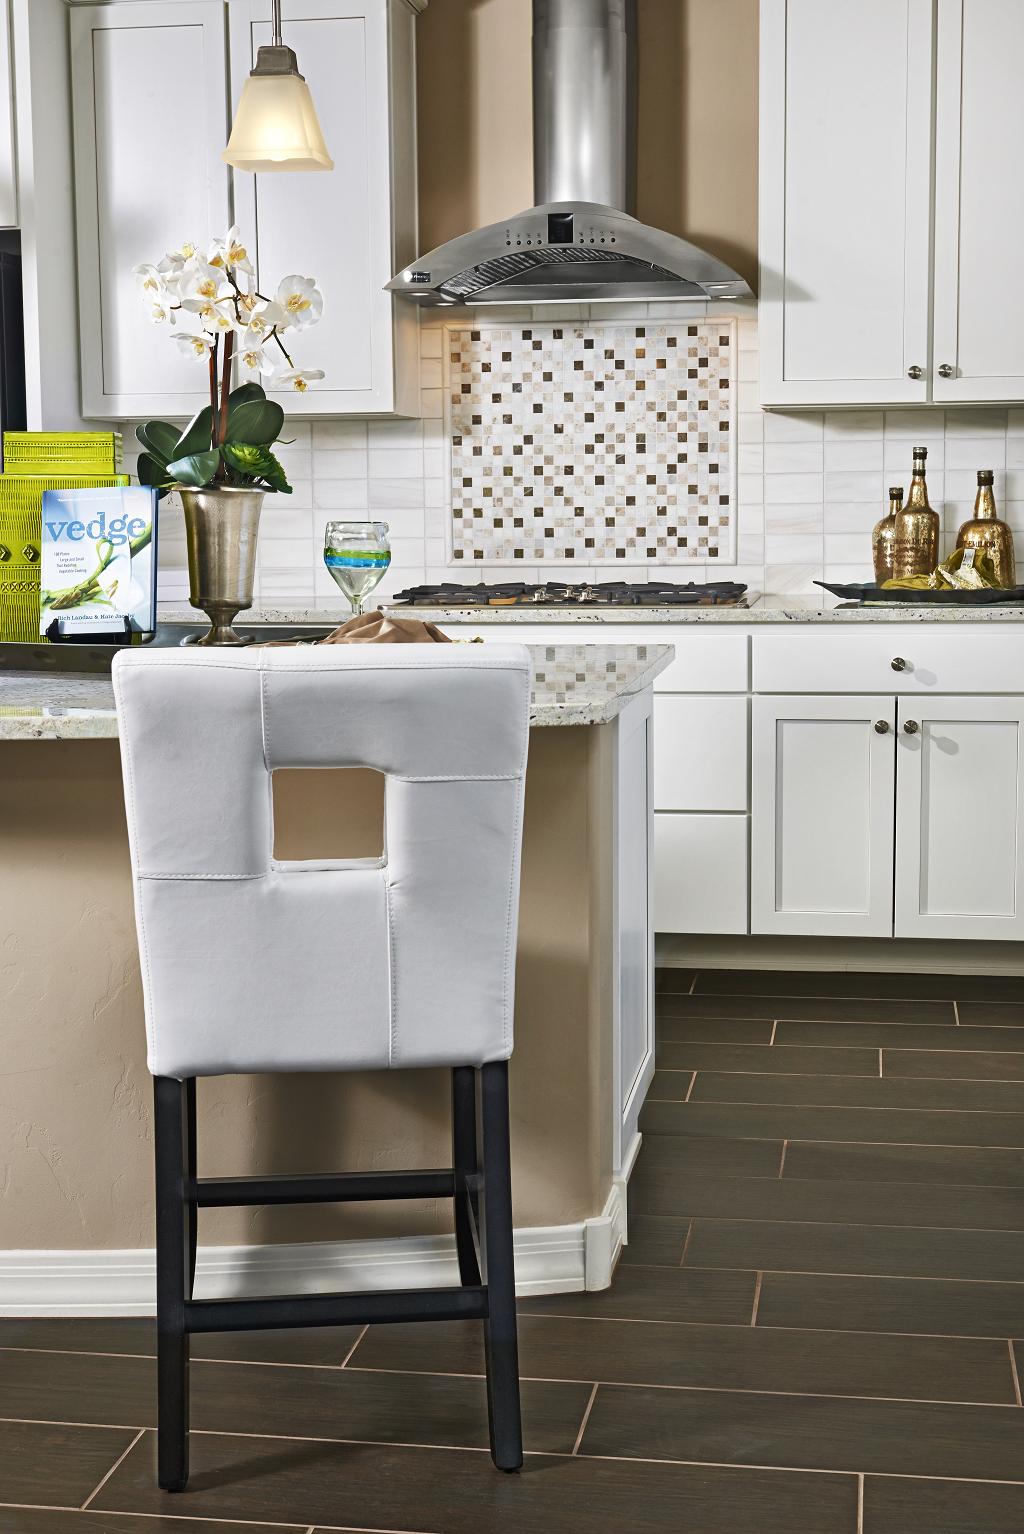 Thomas model home kitchen with white cabinets, tile backsplash ...